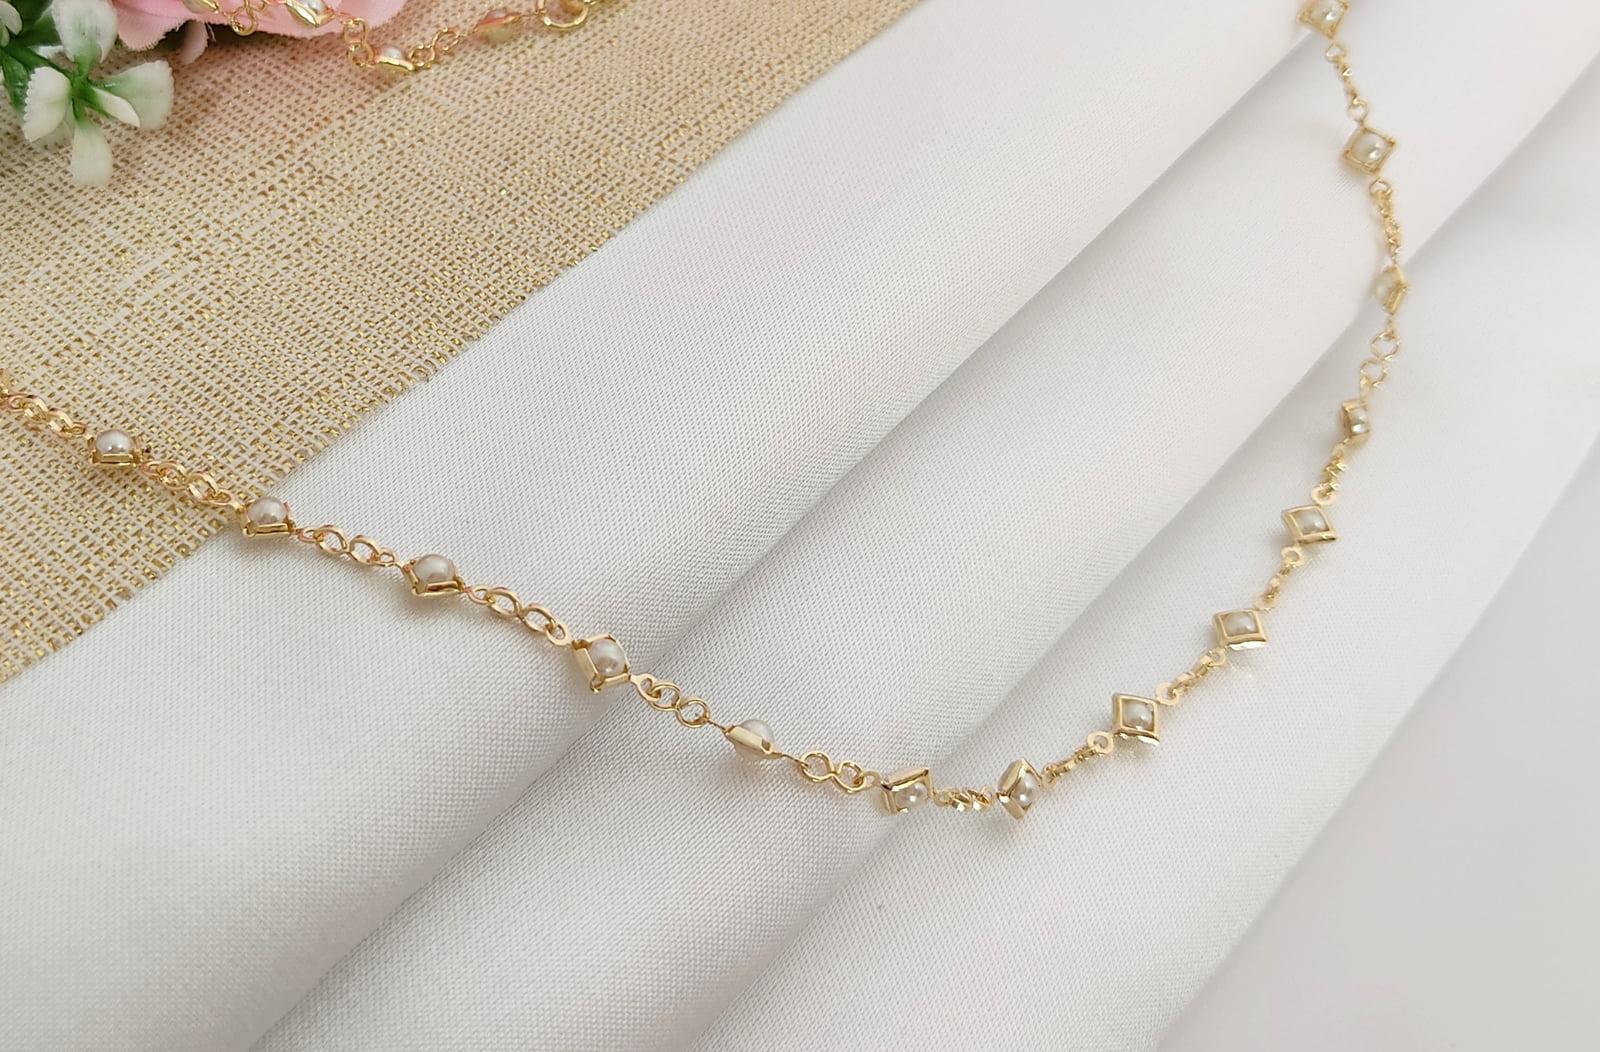 Gargantilha Banhado a Ouro Rafalu (80 cm) - COL0002G1